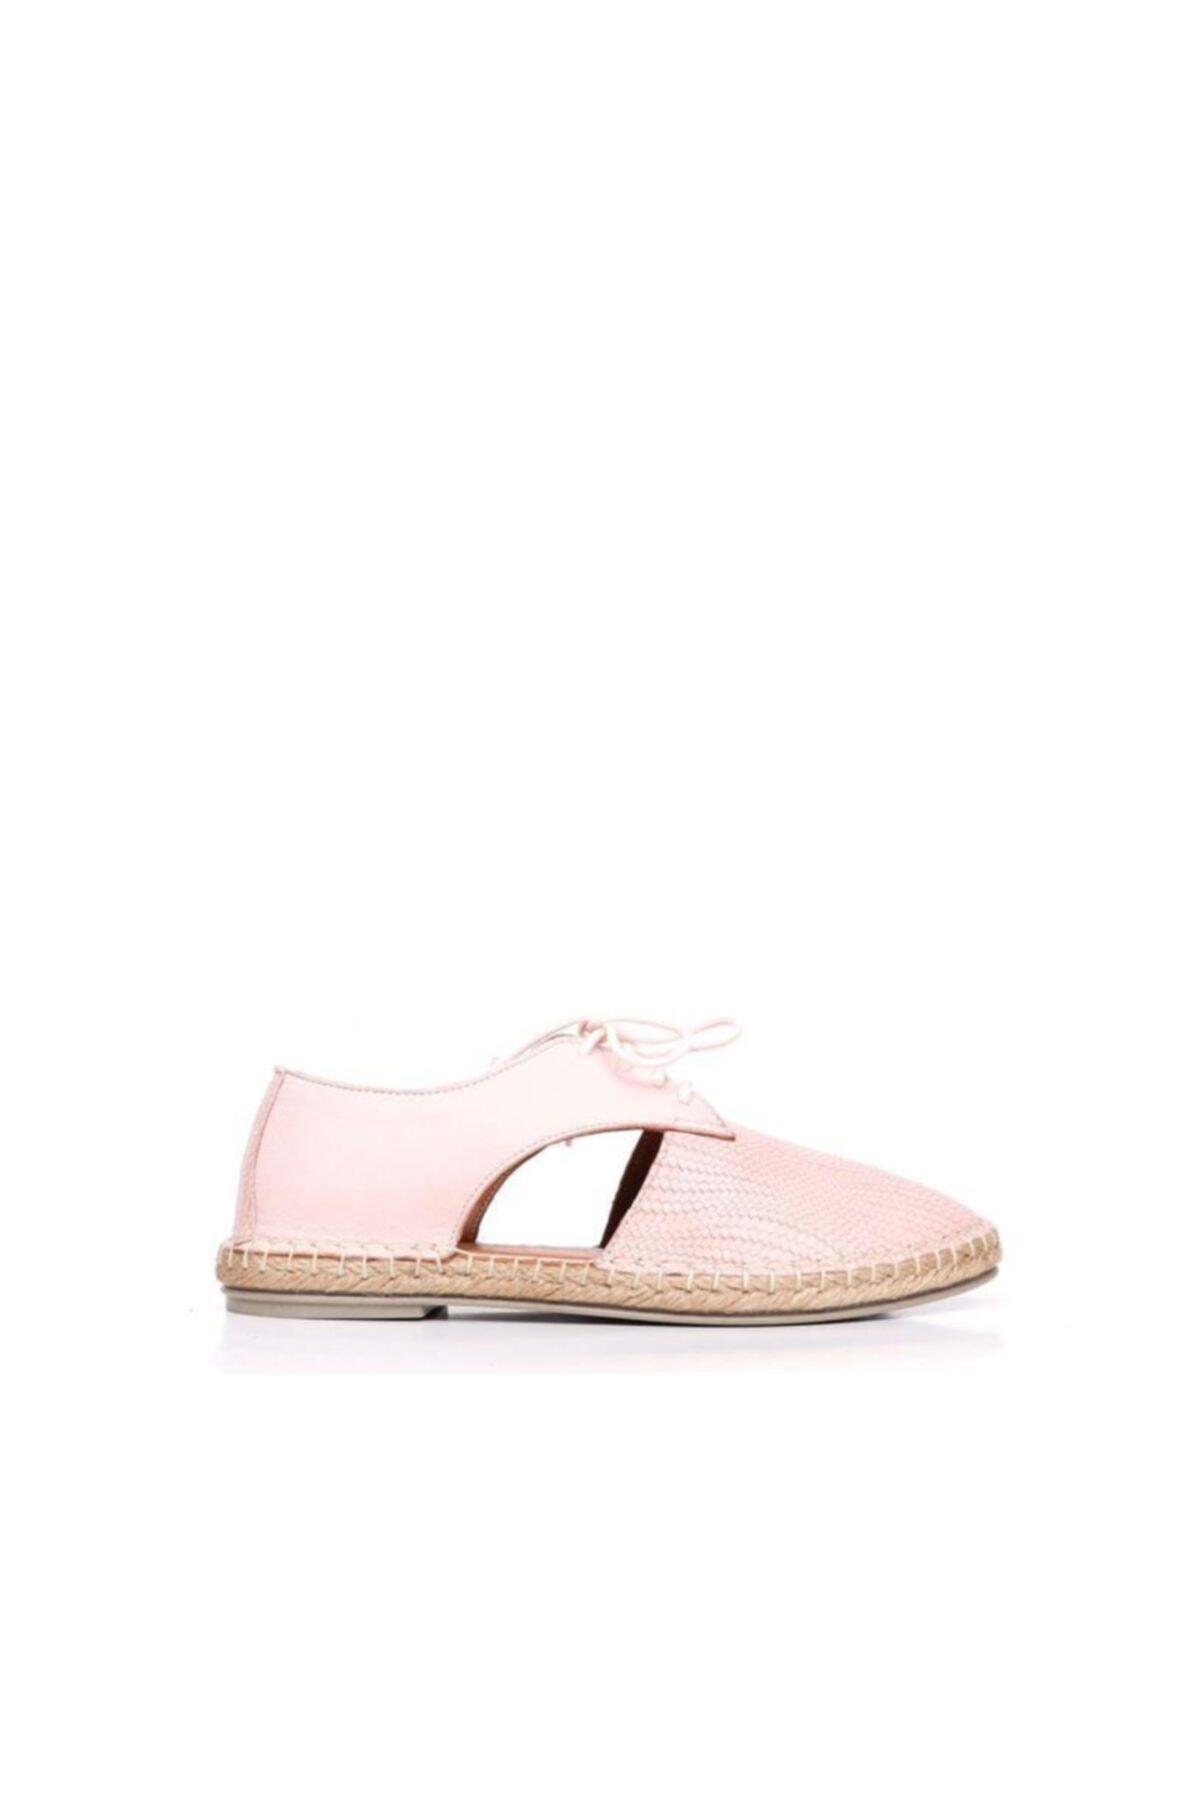 BUENO Shoes Hakı Bayan Ayakkabı 9l0451 1